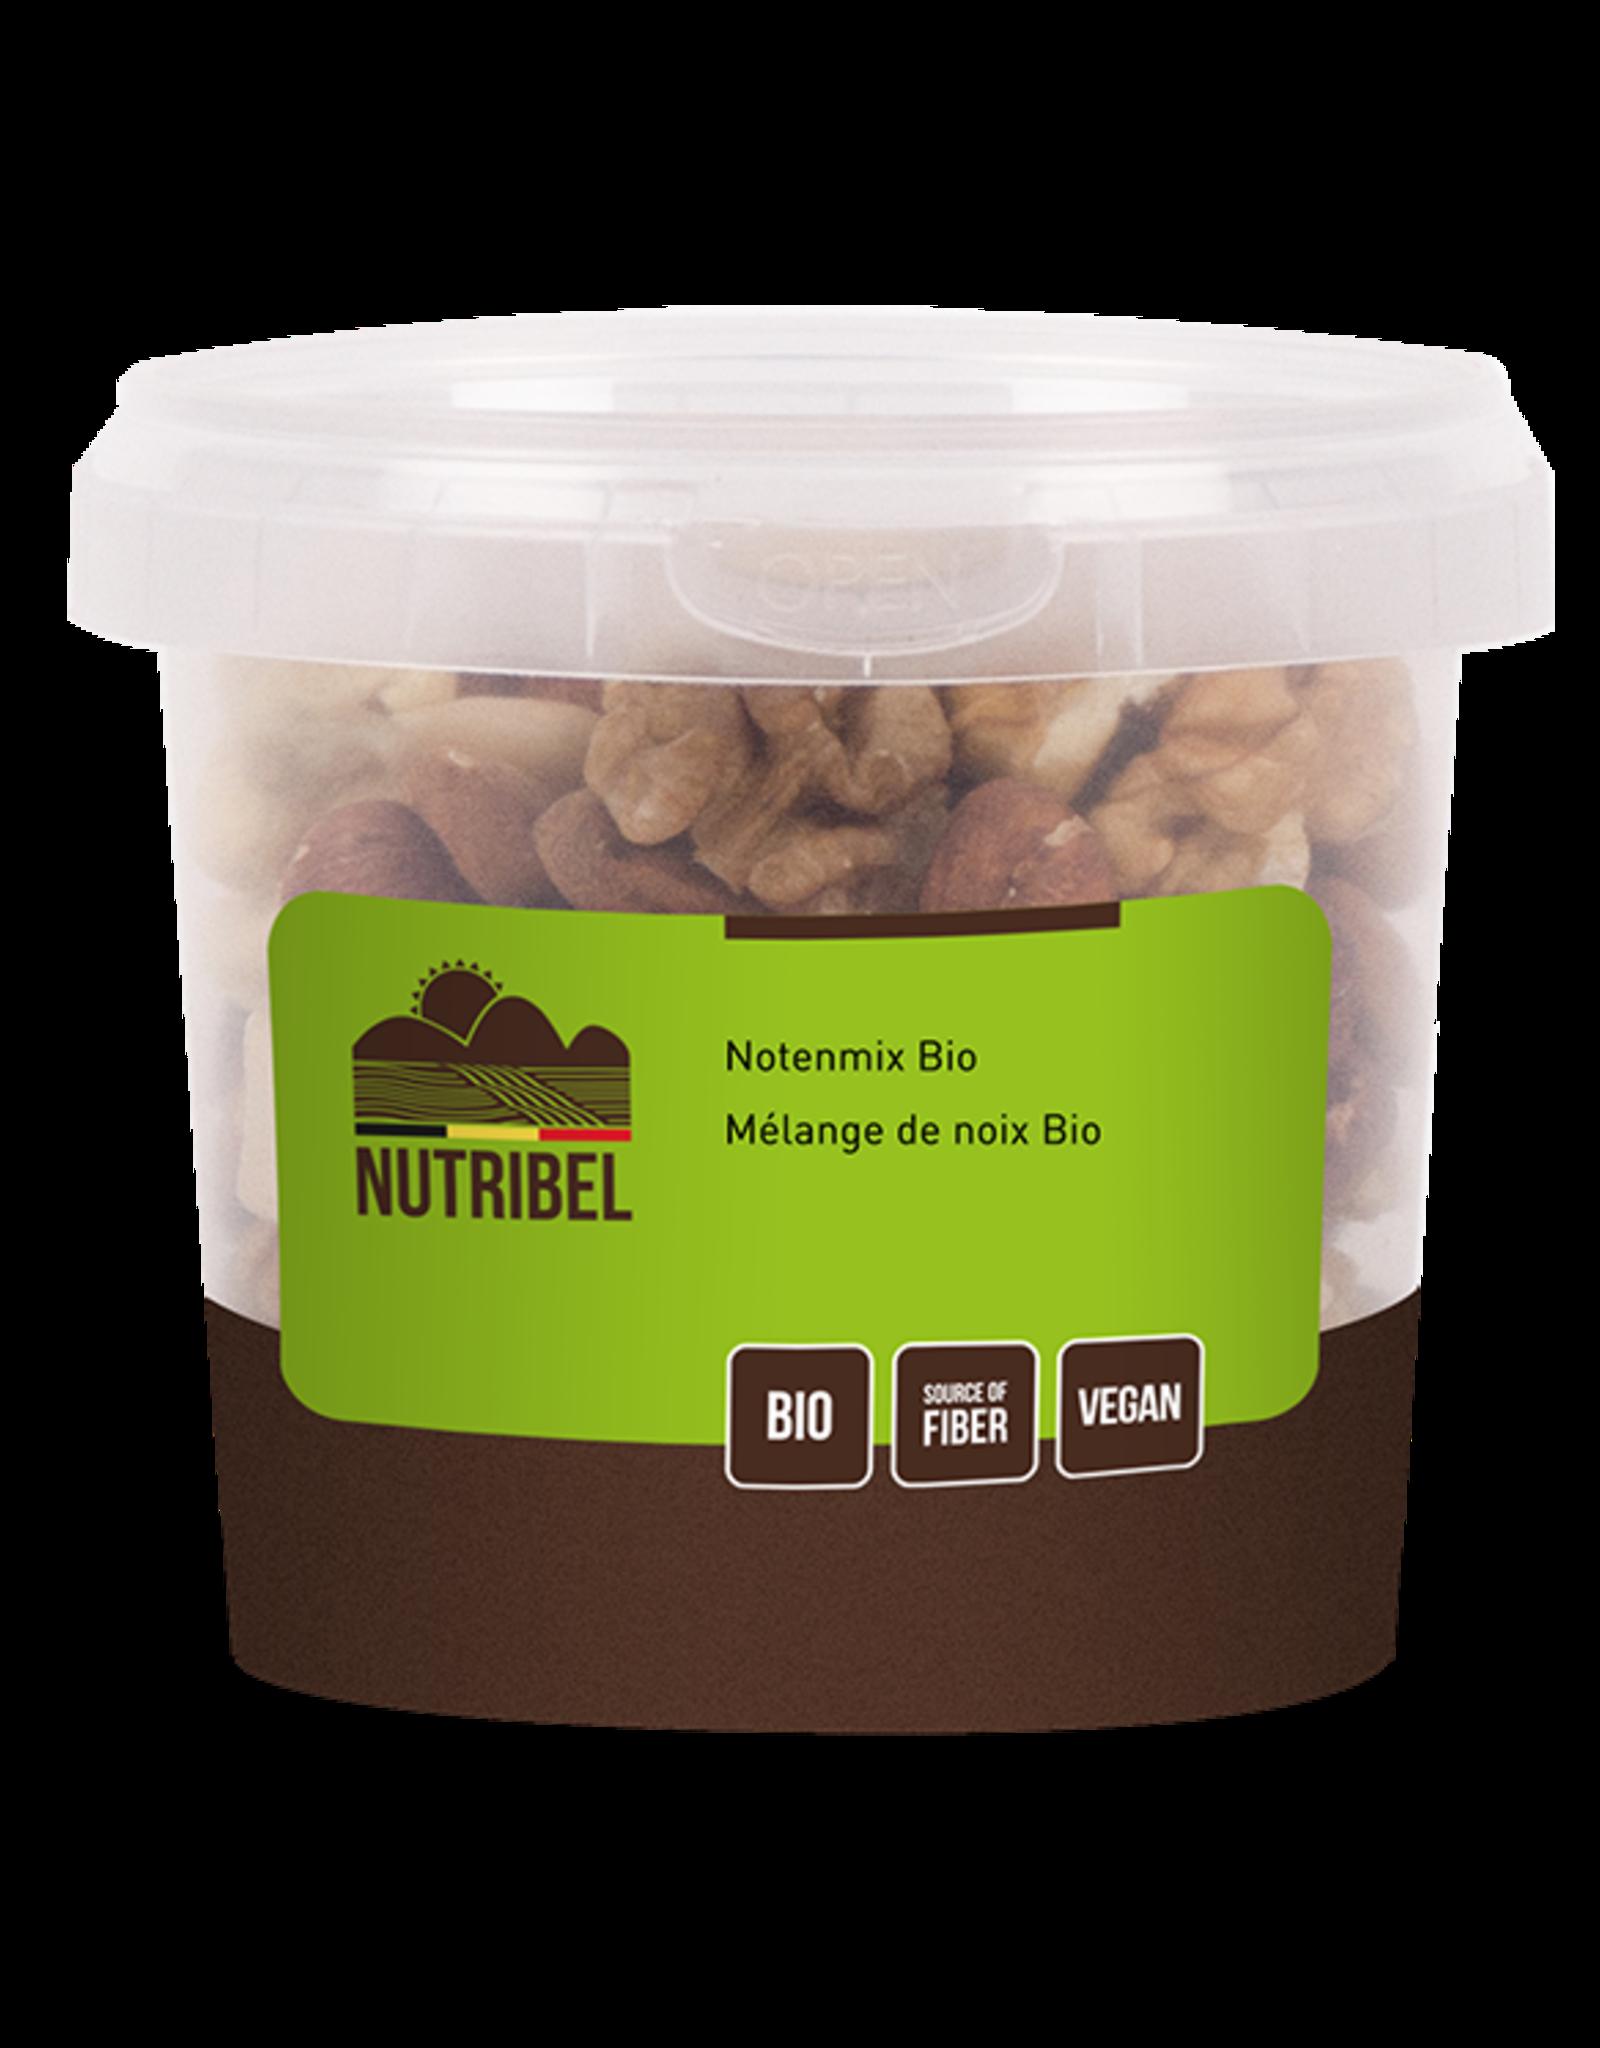 Nutribel Notenmix bio 190g